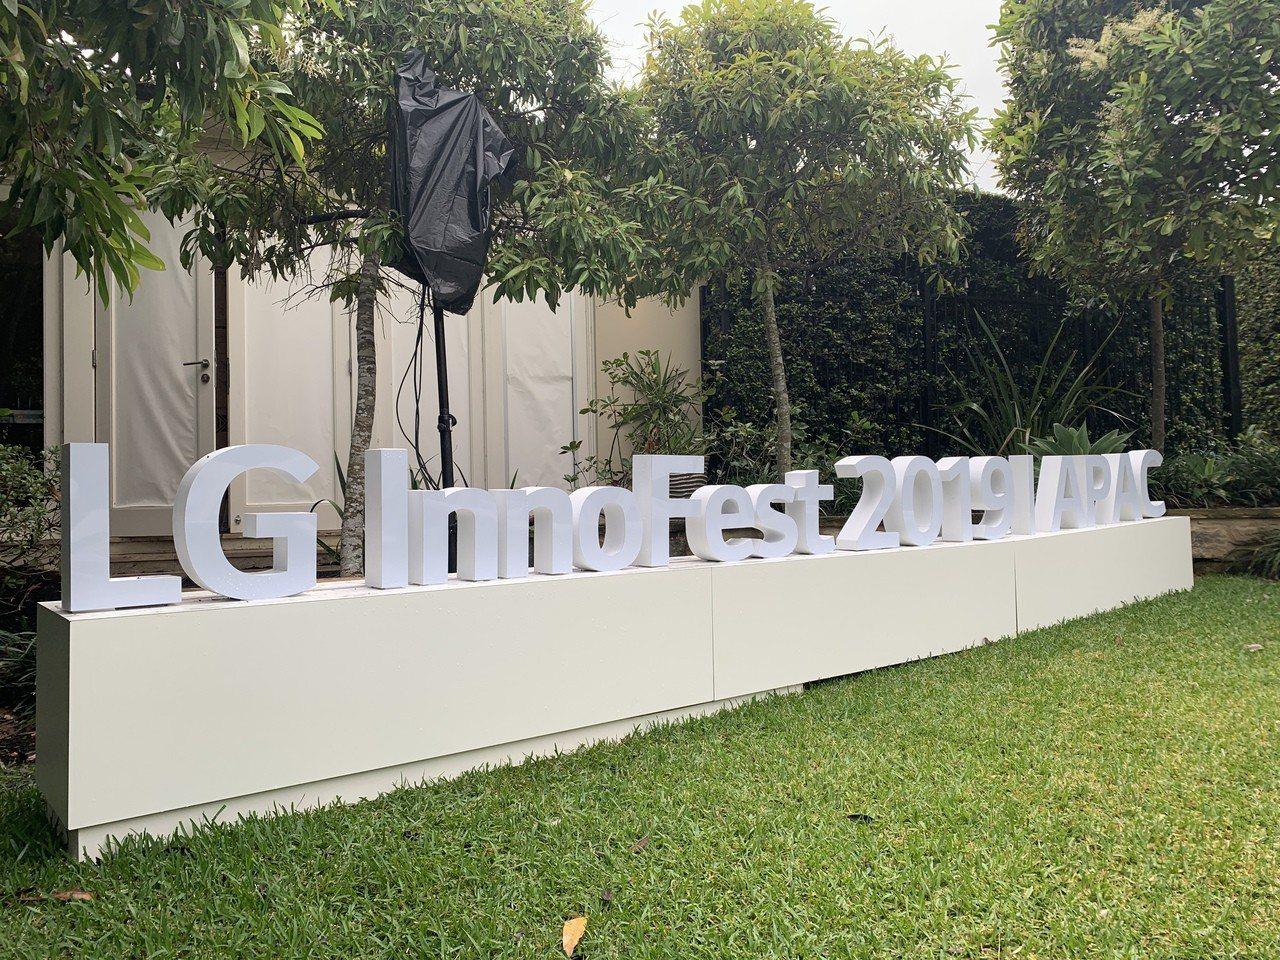 LG InnoFest APAC今年首度於澳洲雪梨盛大舉行。記者黃筱晴/攝影